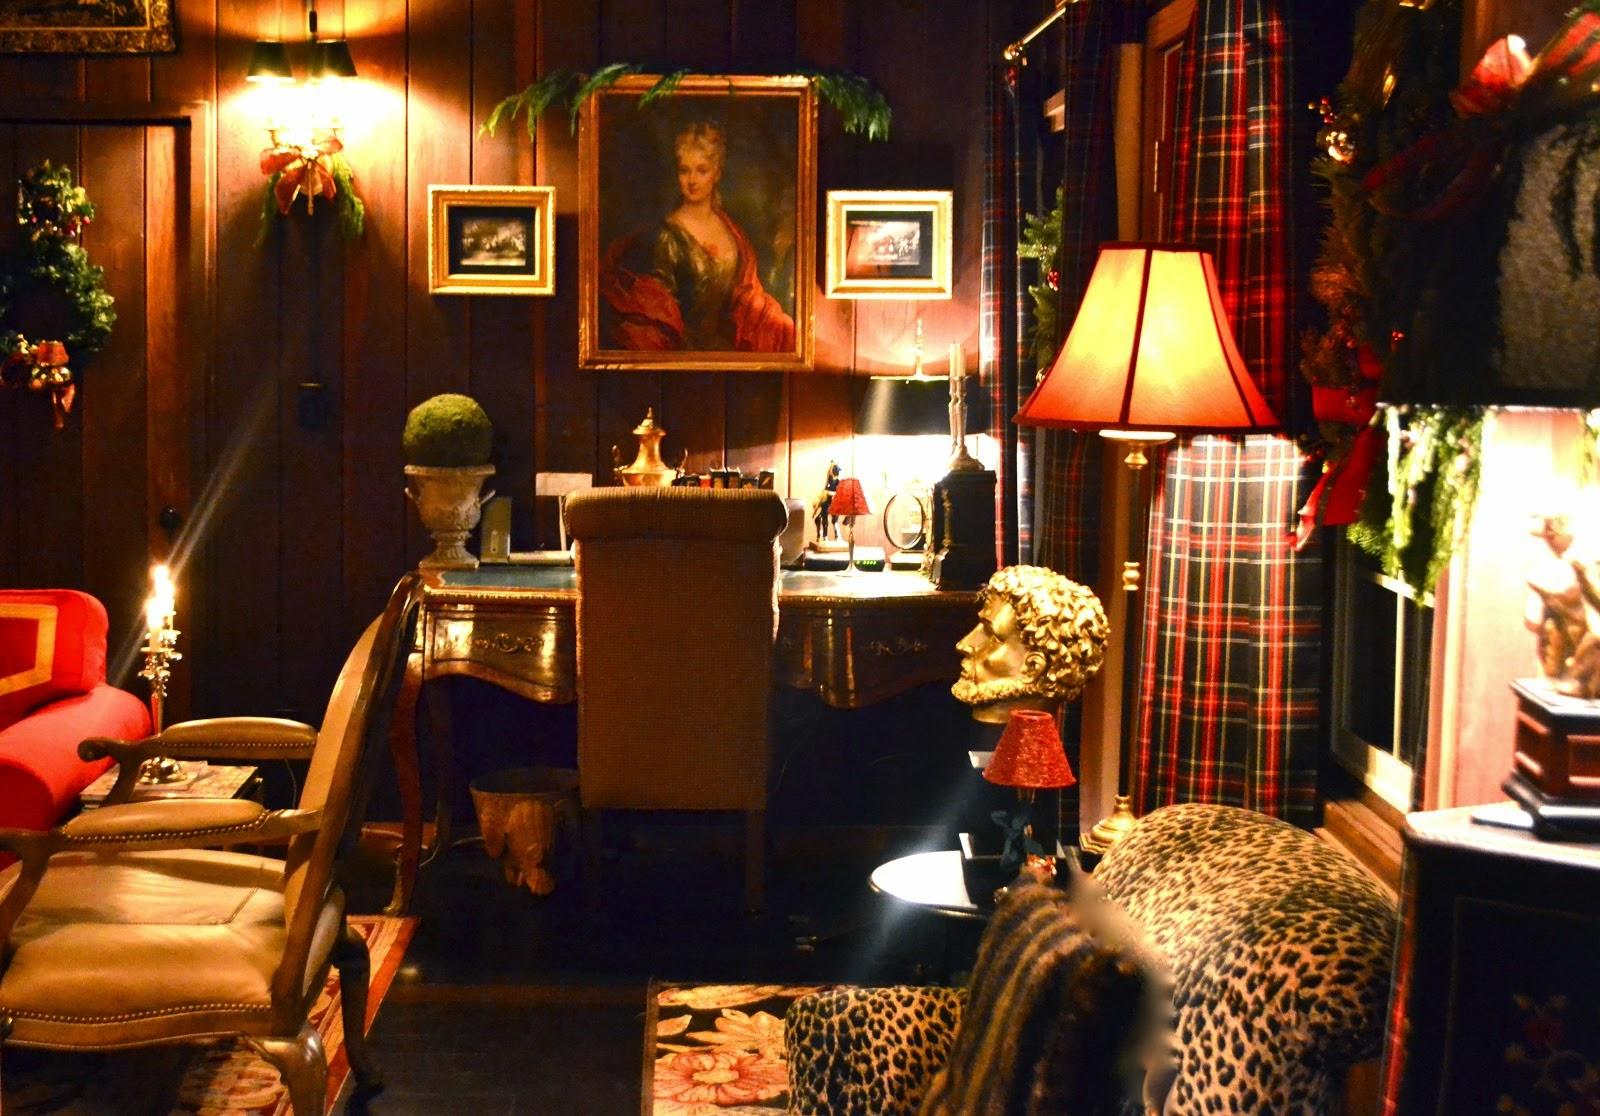 Christmas cabin interior - Christmas Cabin Interior